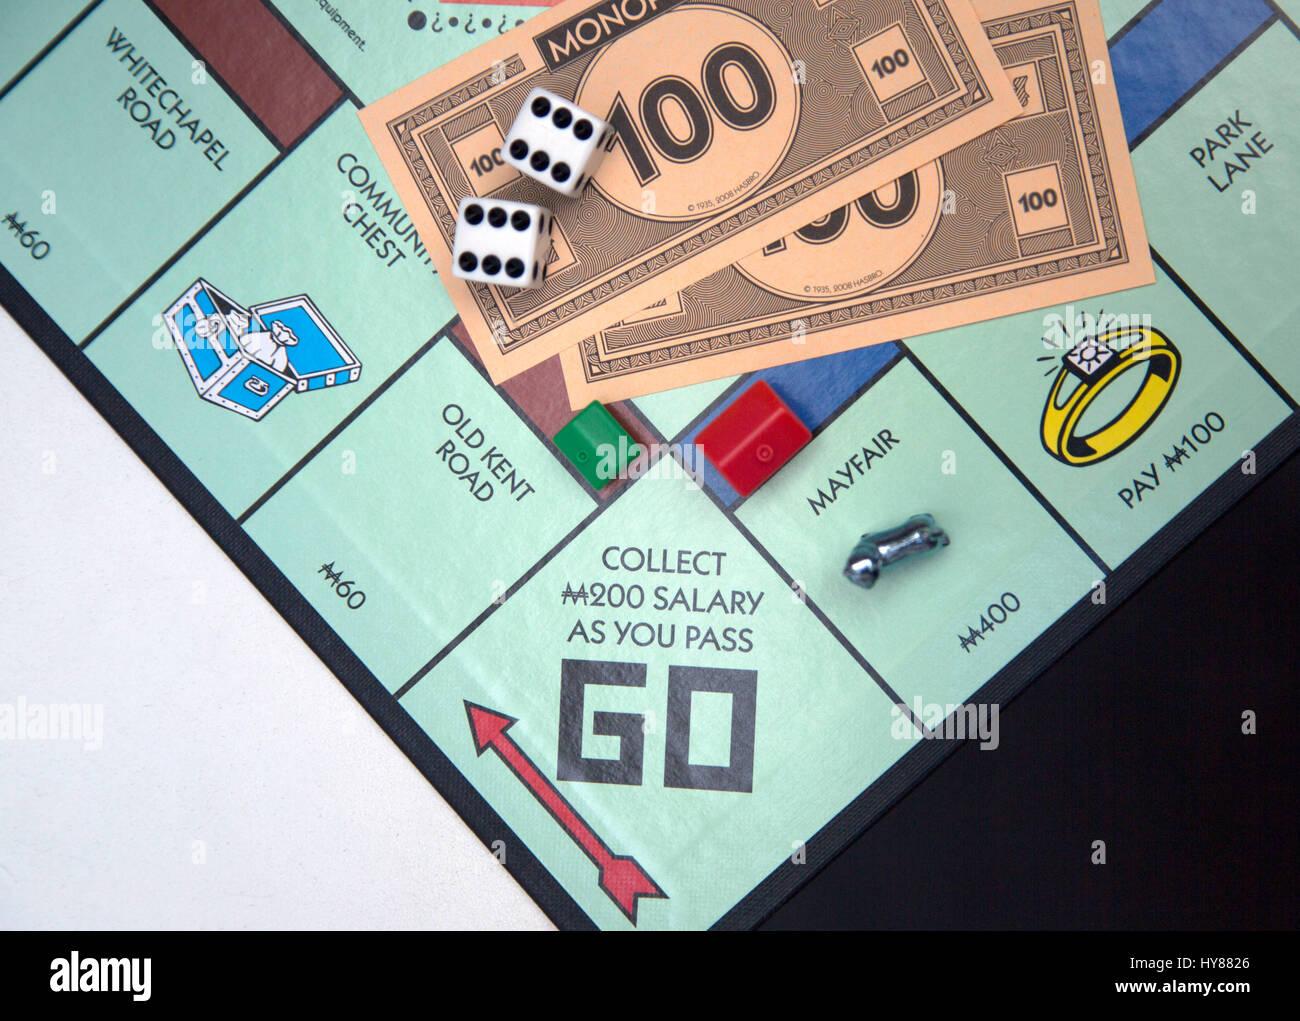 Boardgame Fun Stockfotos & Boardgame Fun Bilder - Alamy